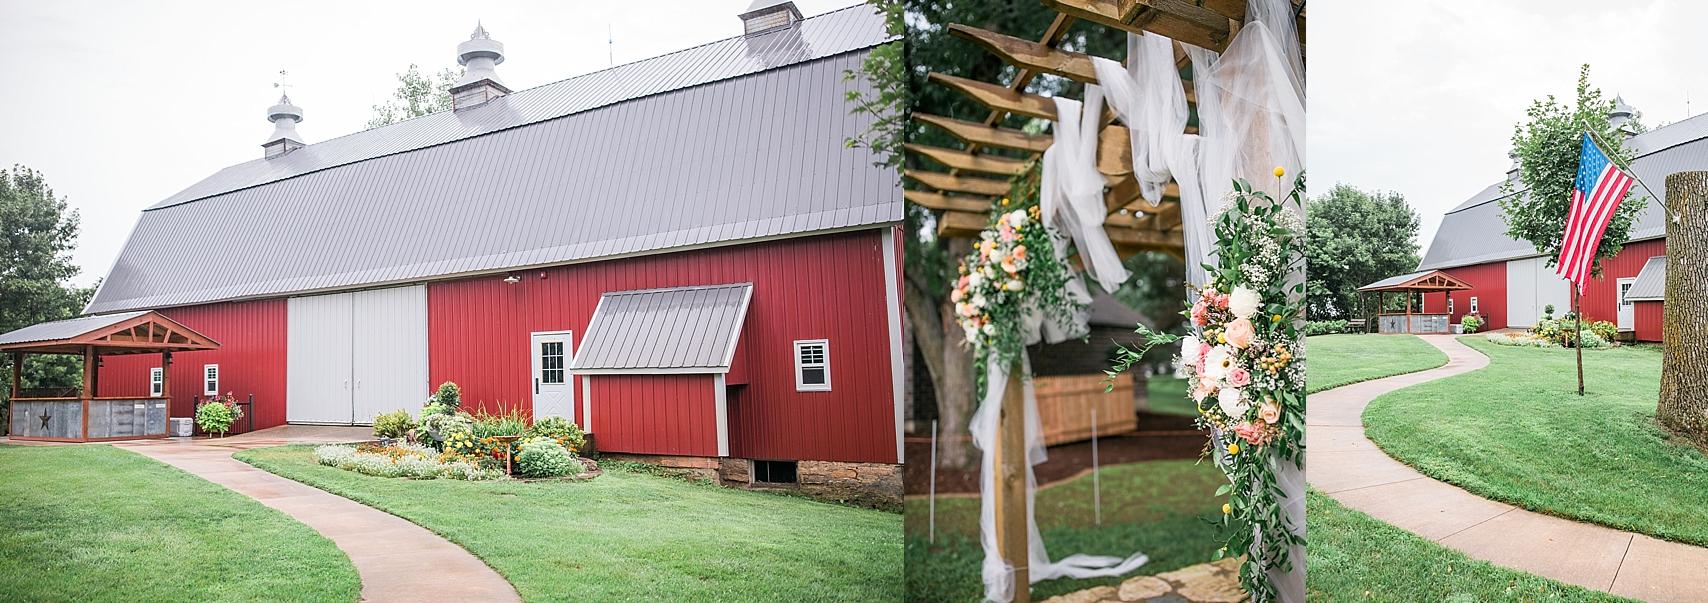 Minnesota Minneapolis Wedding Photographer Best Of 2018 Weddings Mallory Kiesow Photography_0003.jpg